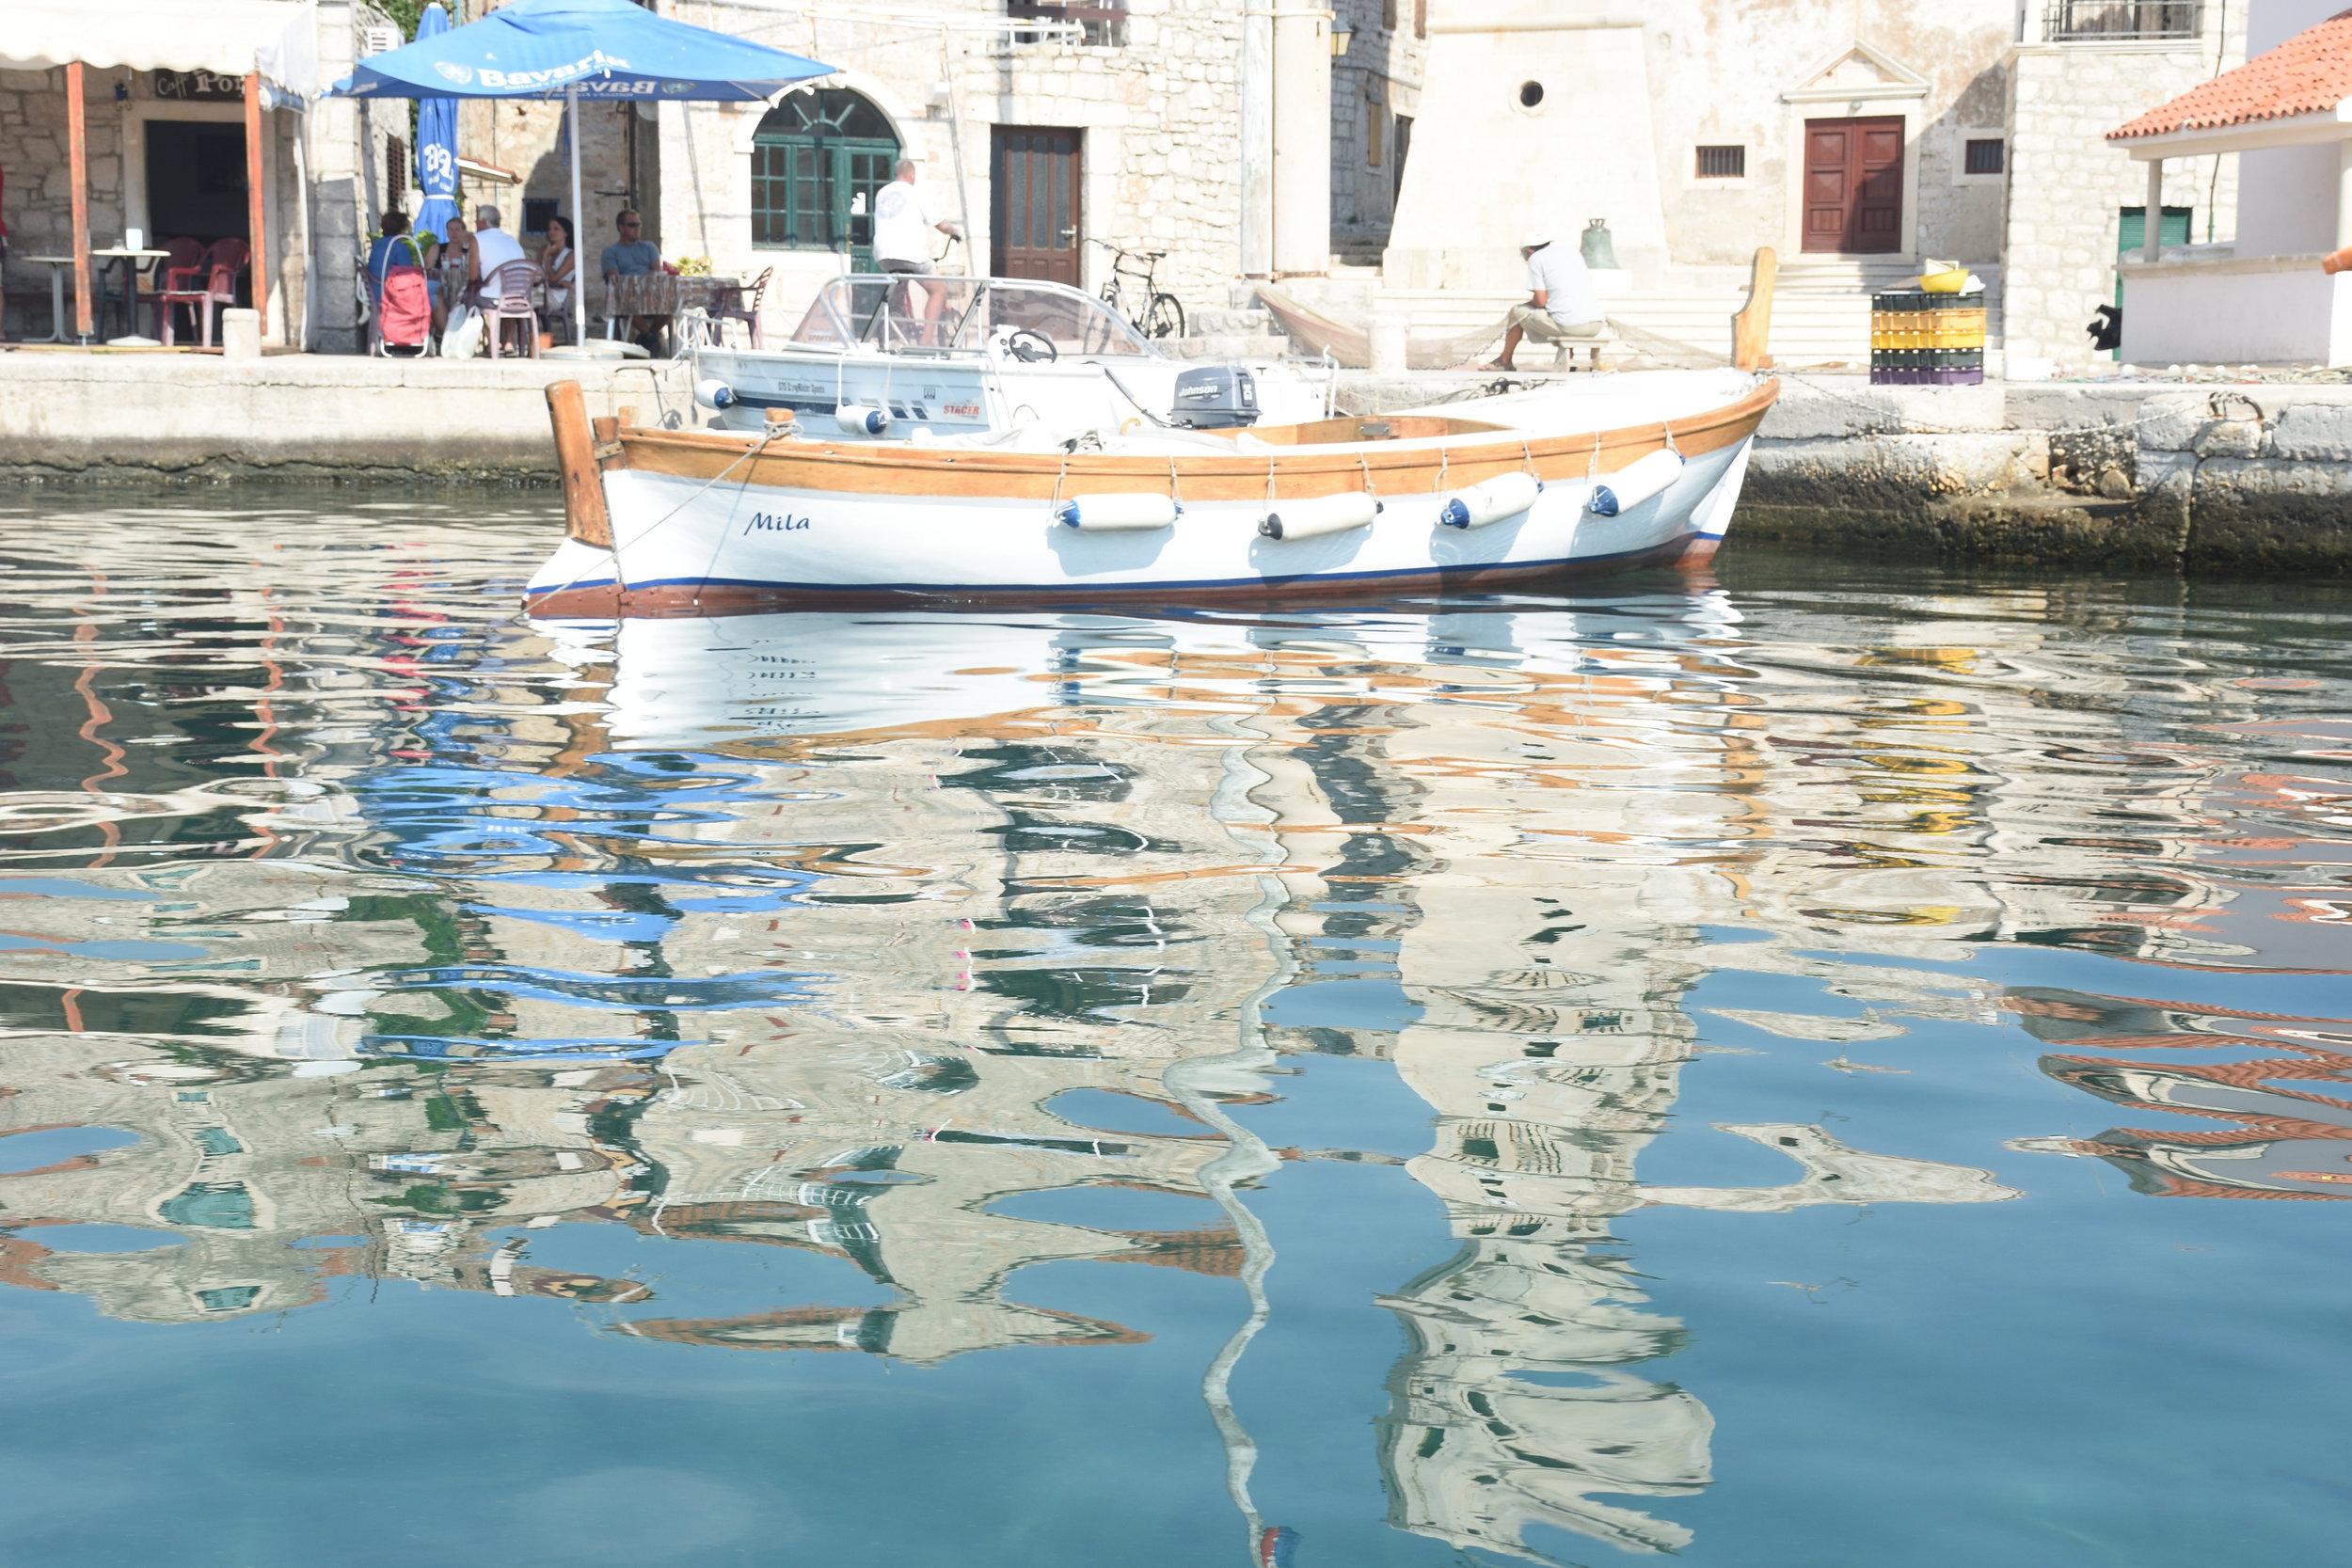 Prvic Sepurine Harbour, Croatia 2016